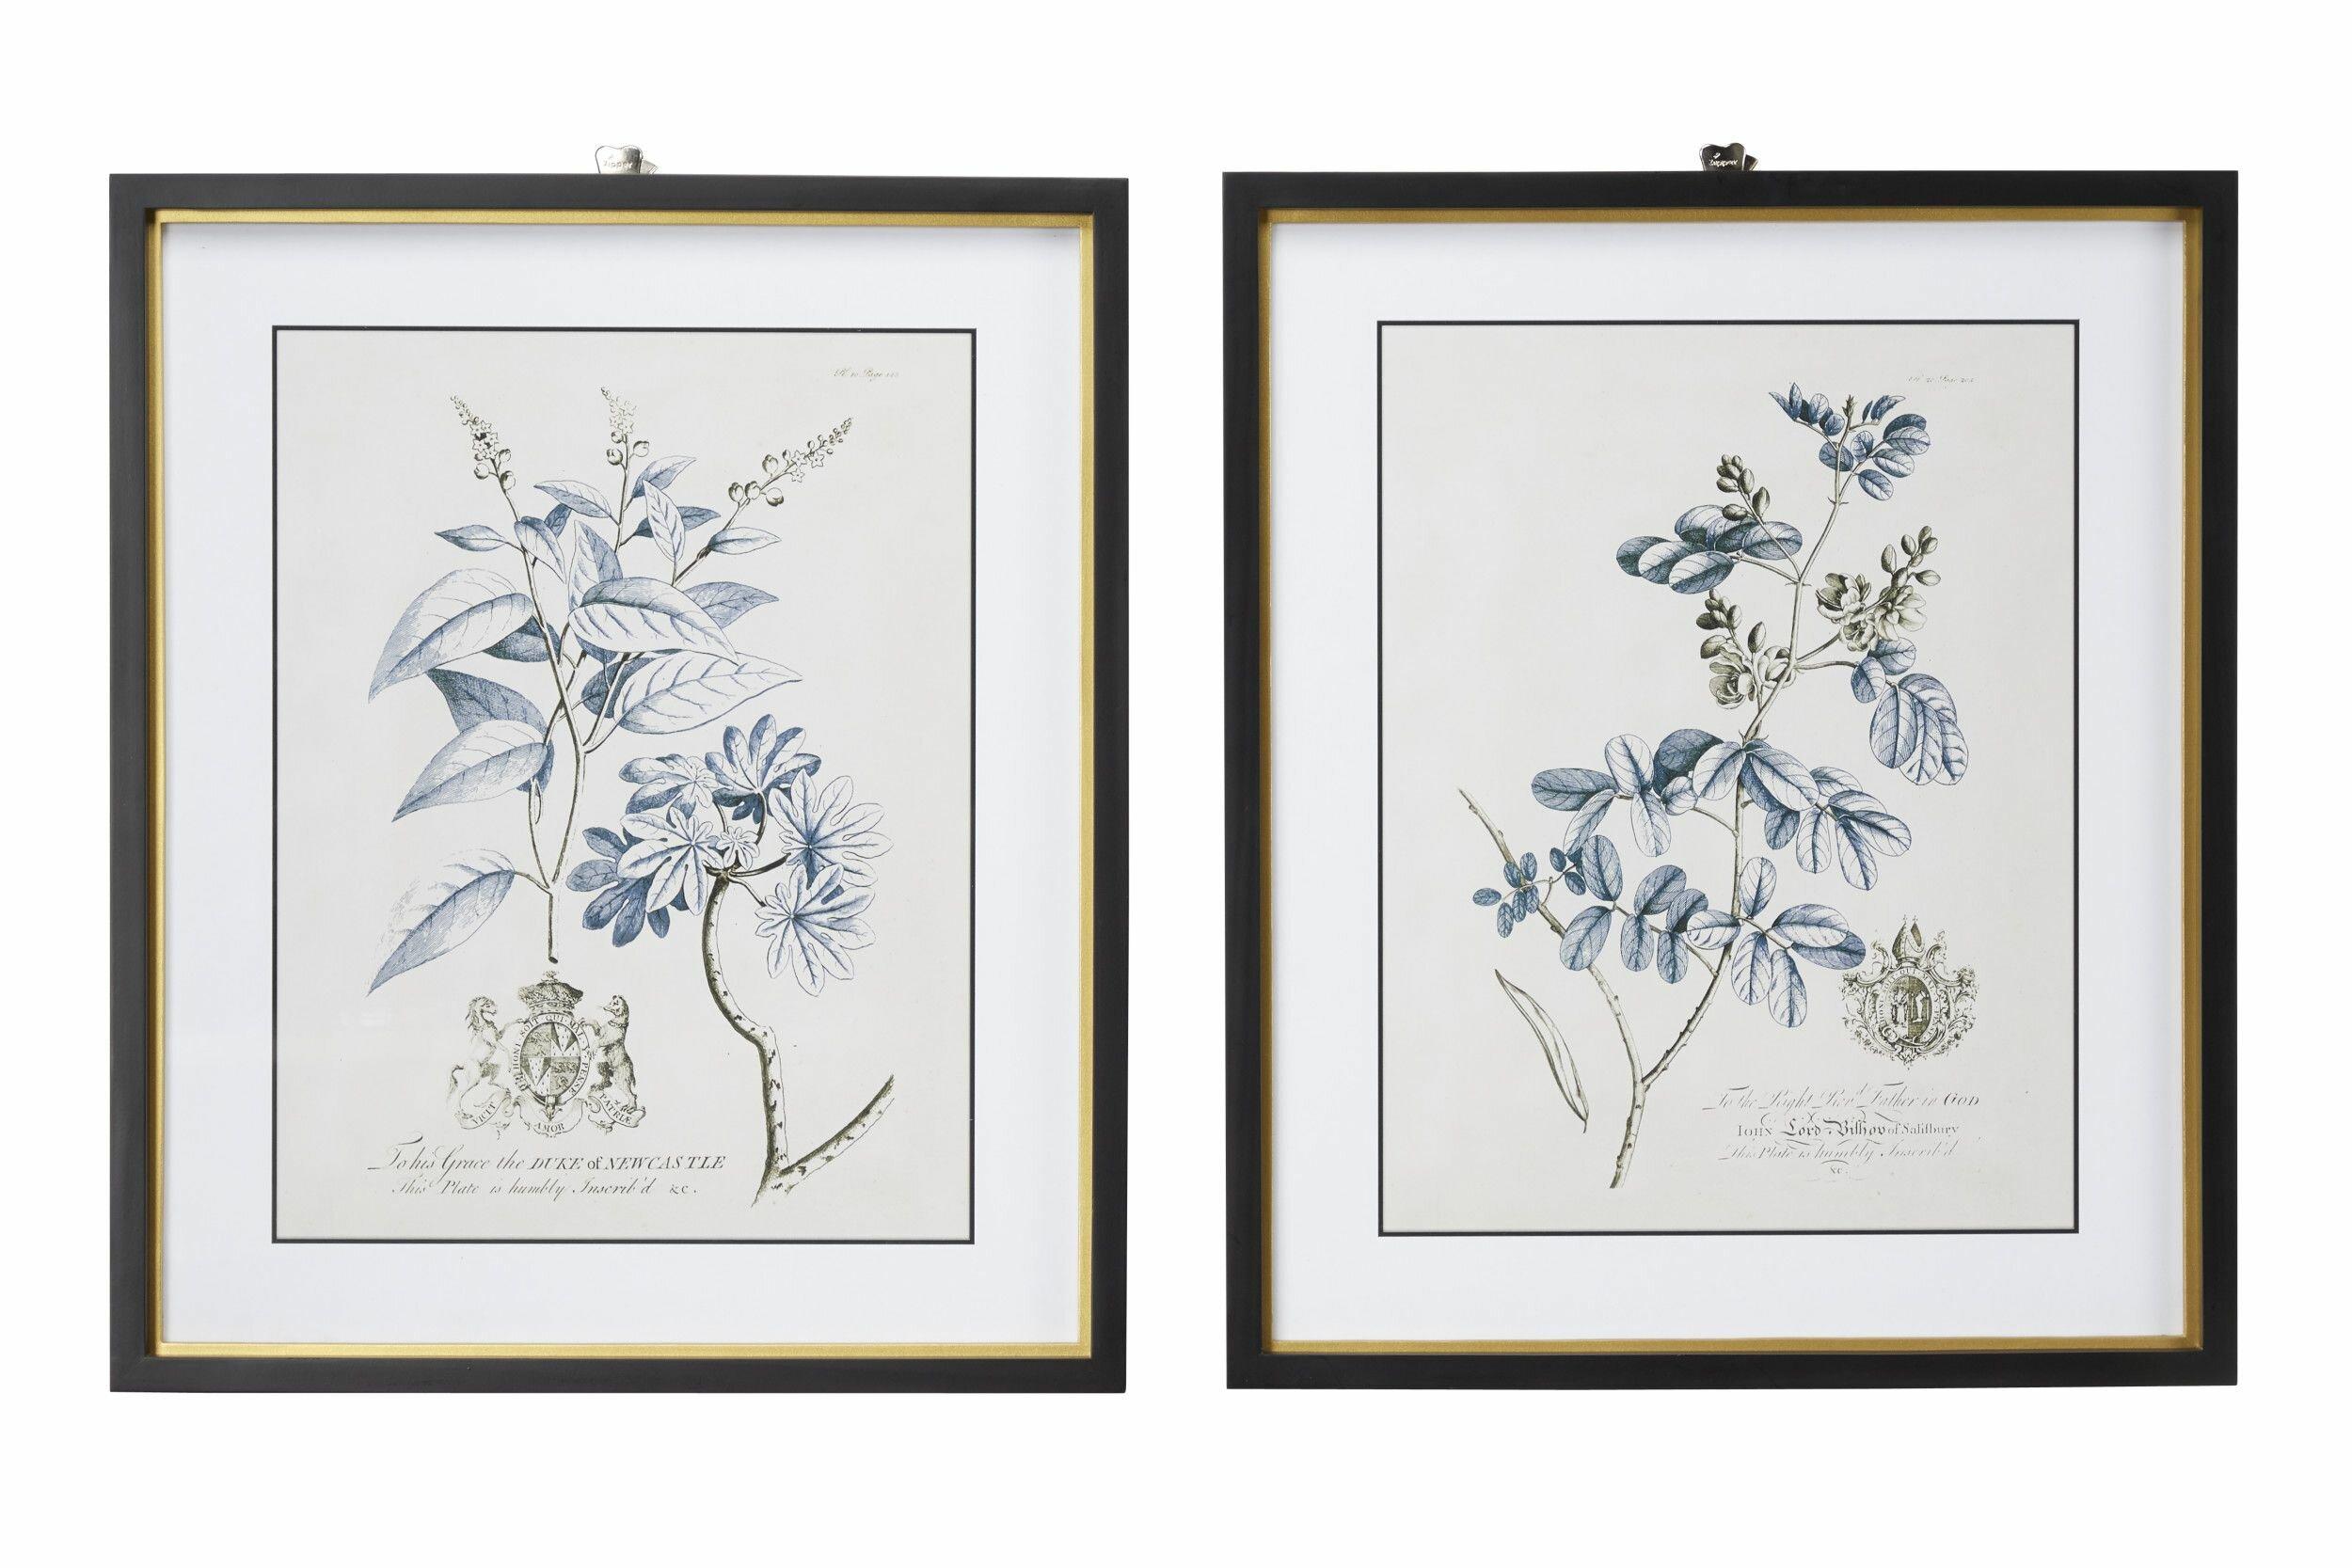 Large Rectangular Blue Vintage Flower Illustrations Framed Wall Art Set Of 2 20 X 24 Each